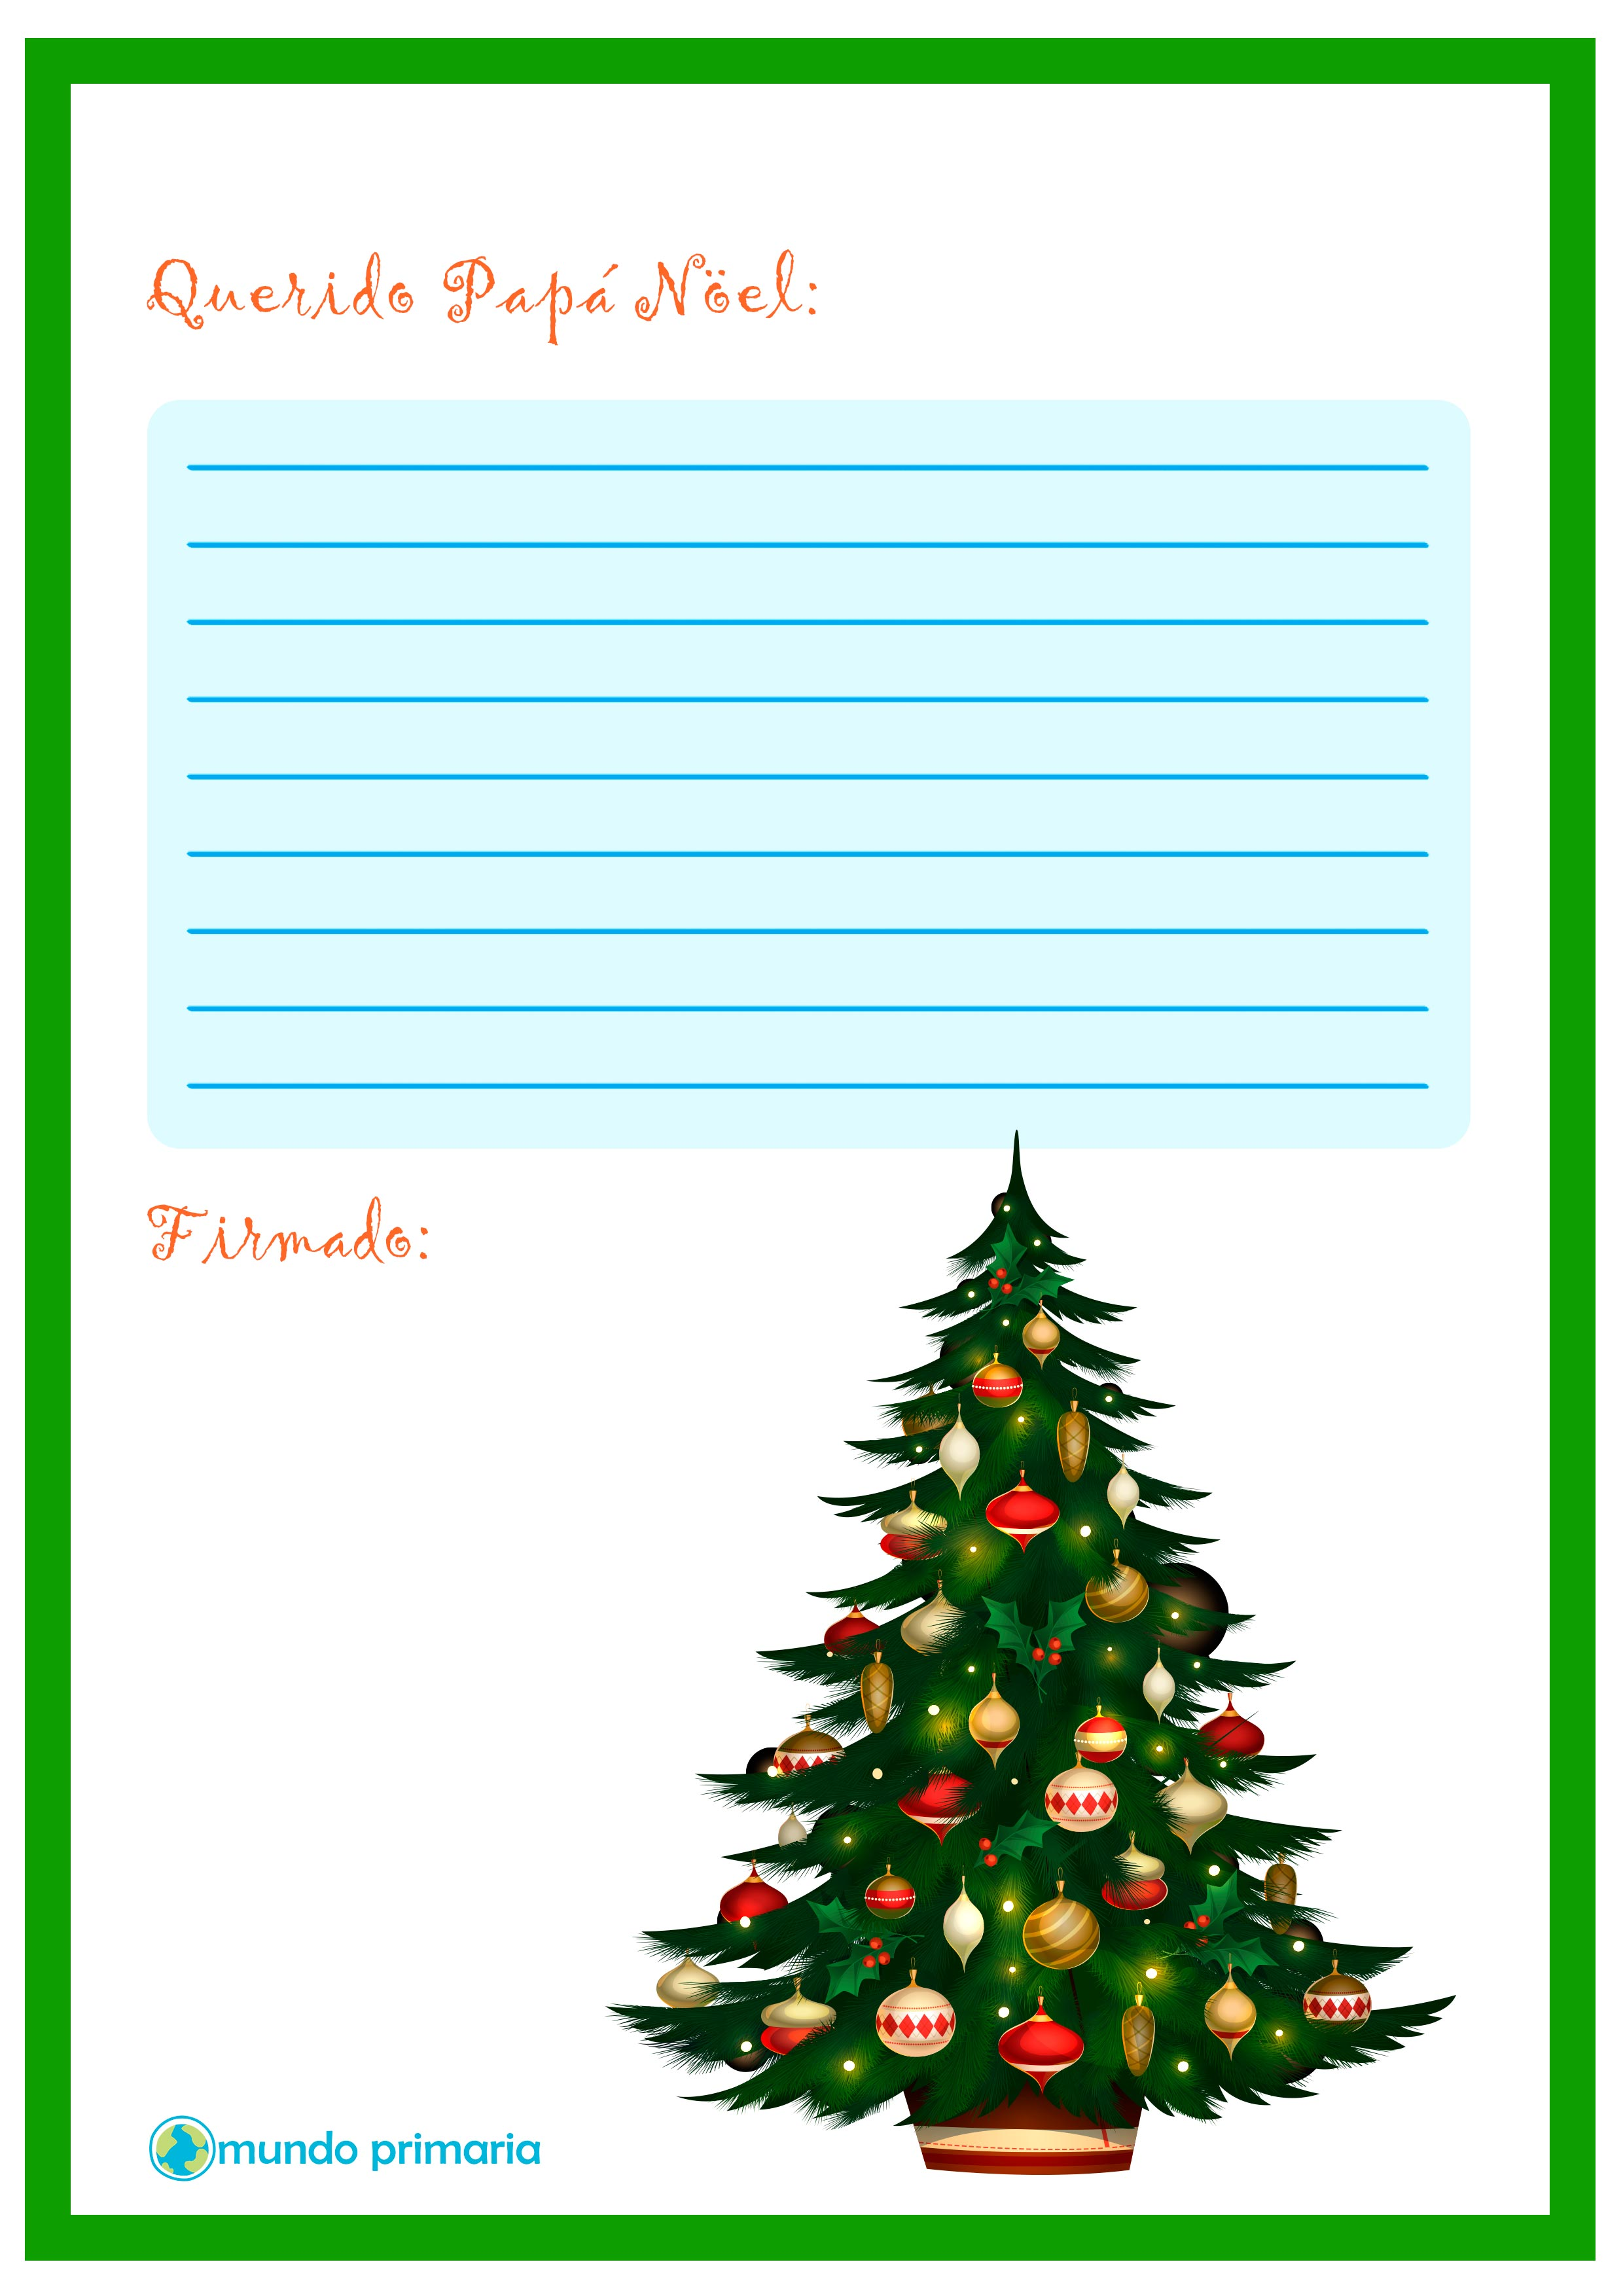 Carta de arbol navideño para Papa Noel